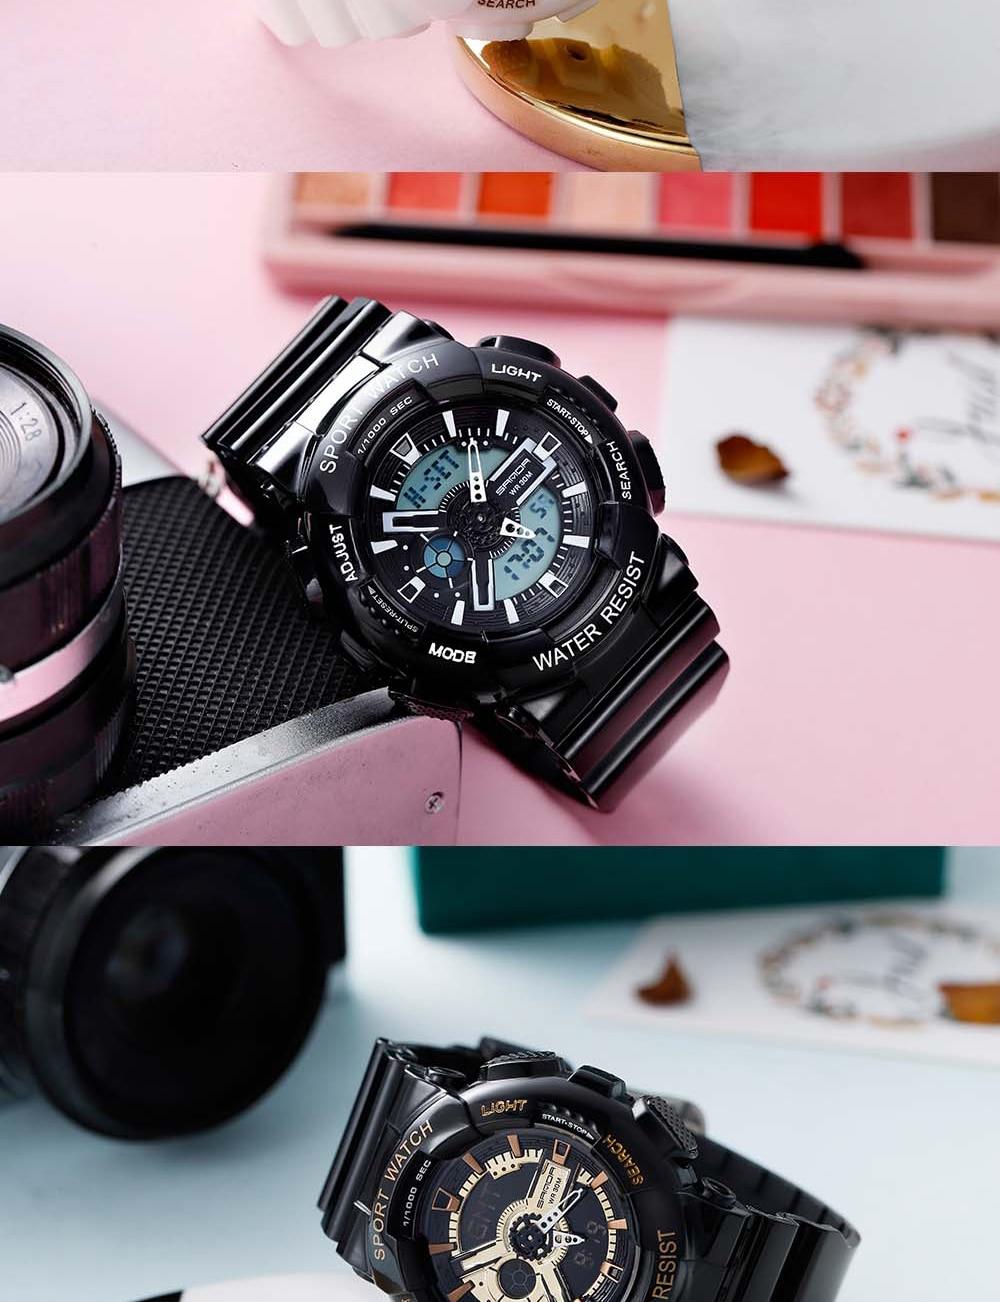 H43b696bd545746fcb5a70fb633eb6177n 2020 SANDA Military Men's Watch Brand Luxury Waterproof Sport Wristwatch Fashion Quartz Clock Couple Watch relogio masculino